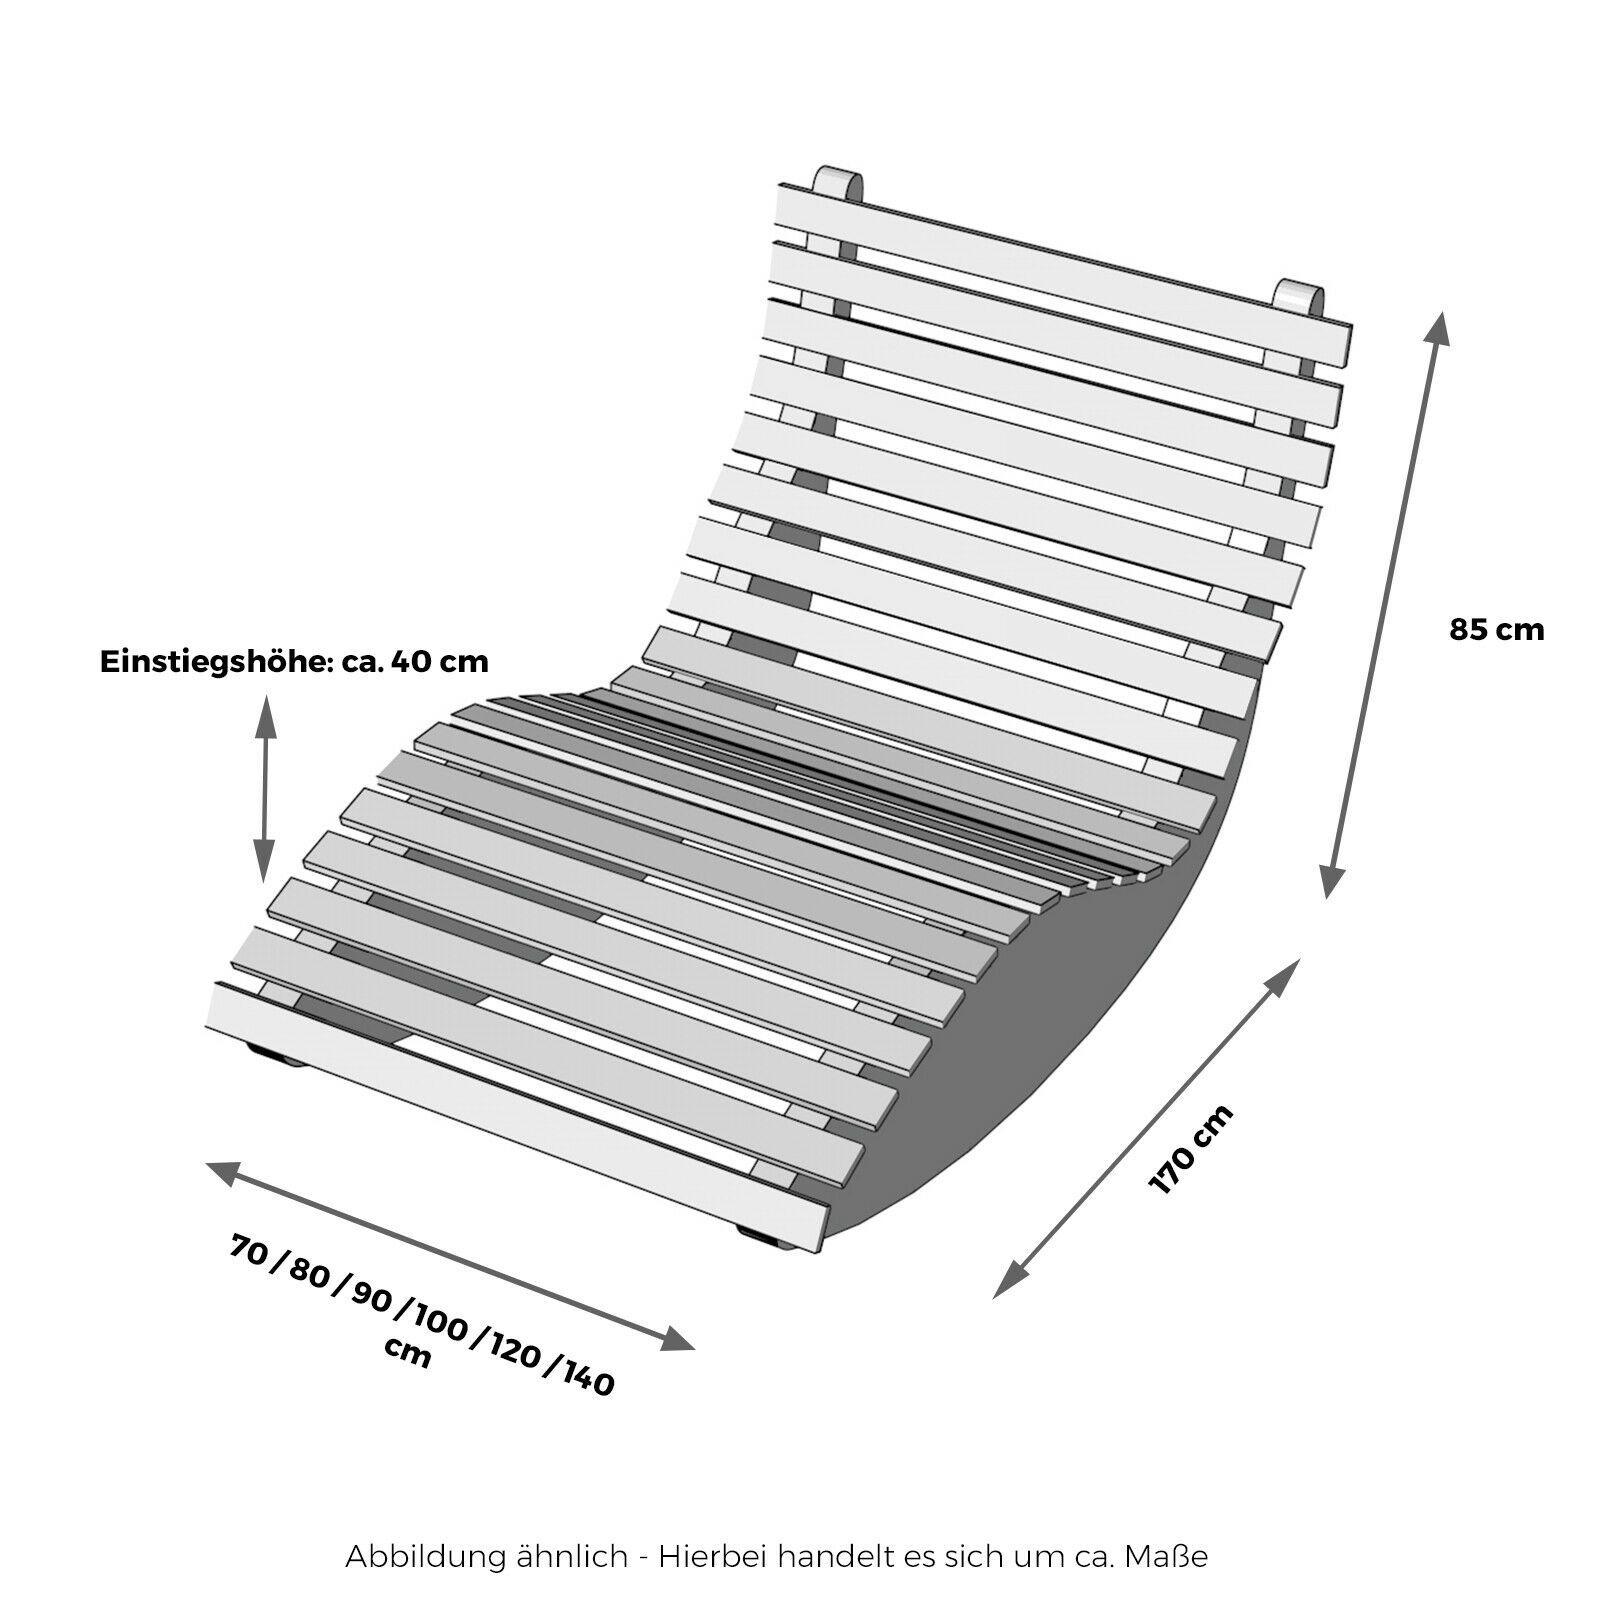 Lamellentur Kiefer Geschlossen 71 7 Cm X 49 4 Cm Cm X 2 1 Cm Kaufen Bei Obi